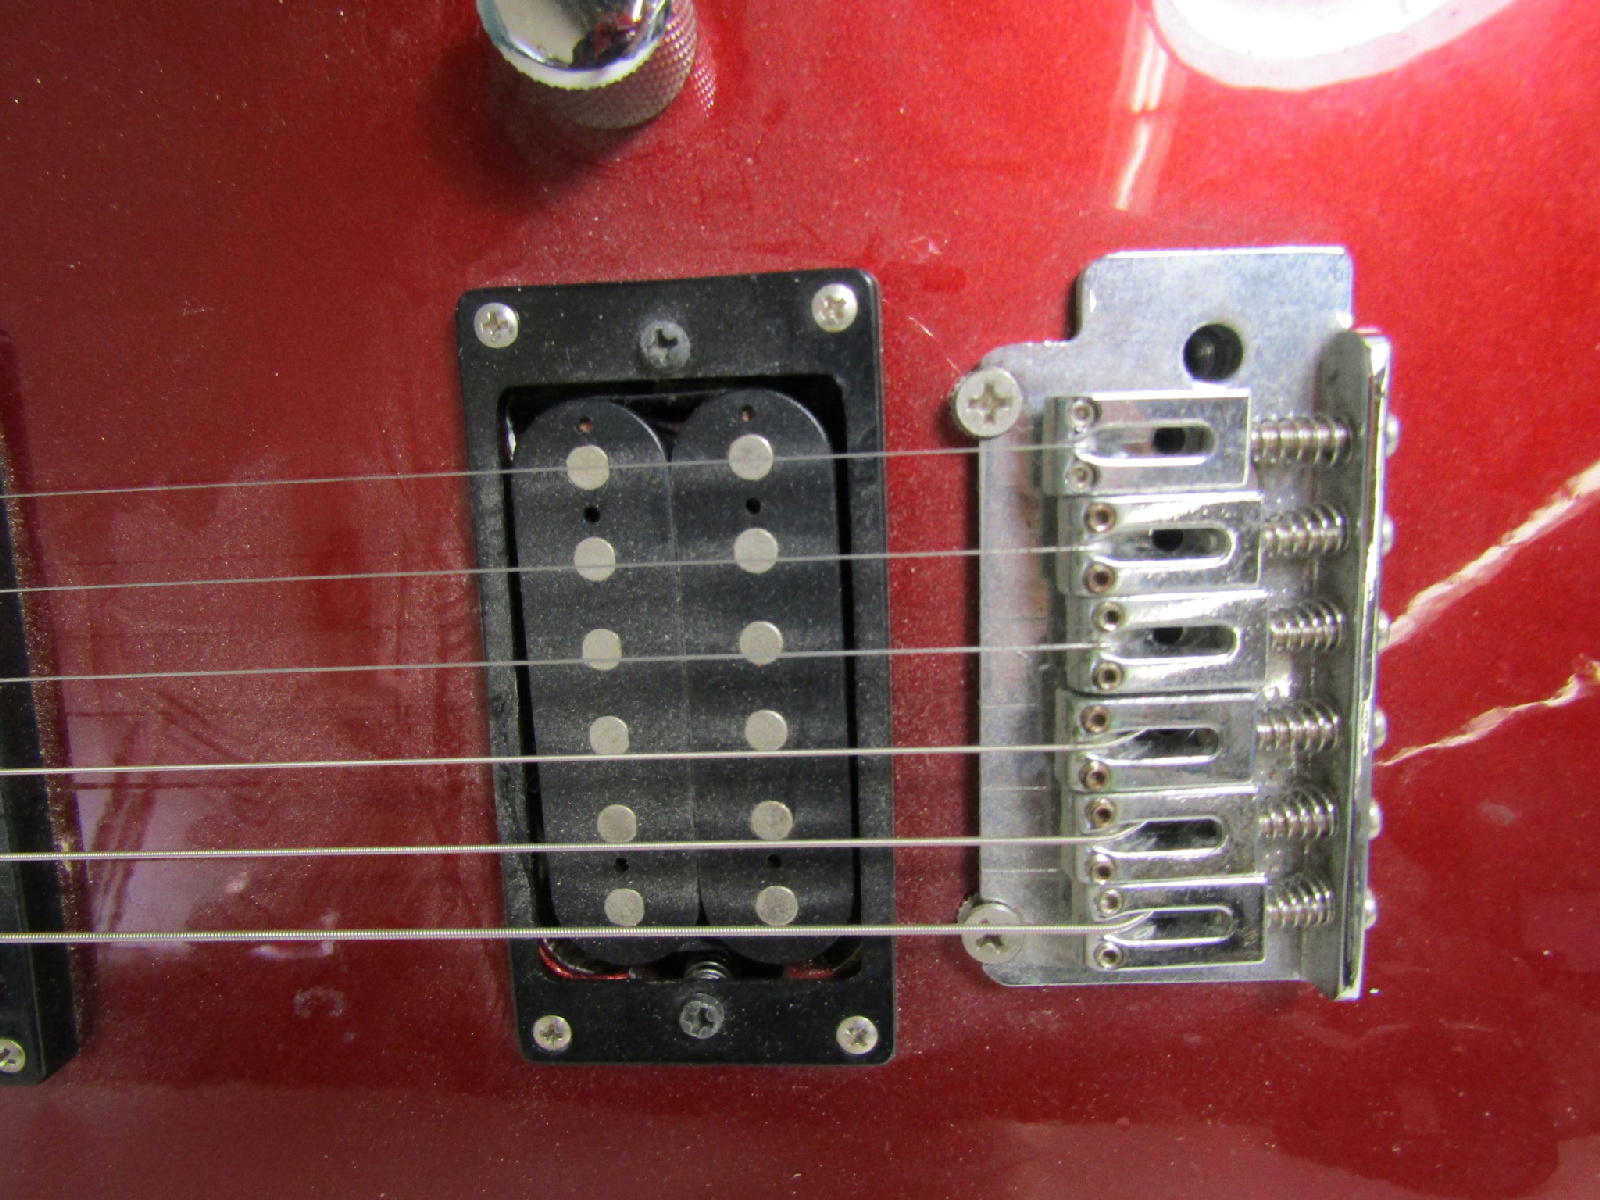 jackson electric guitar red strat rg style cracked parts. Black Bedroom Furniture Sets. Home Design Ideas